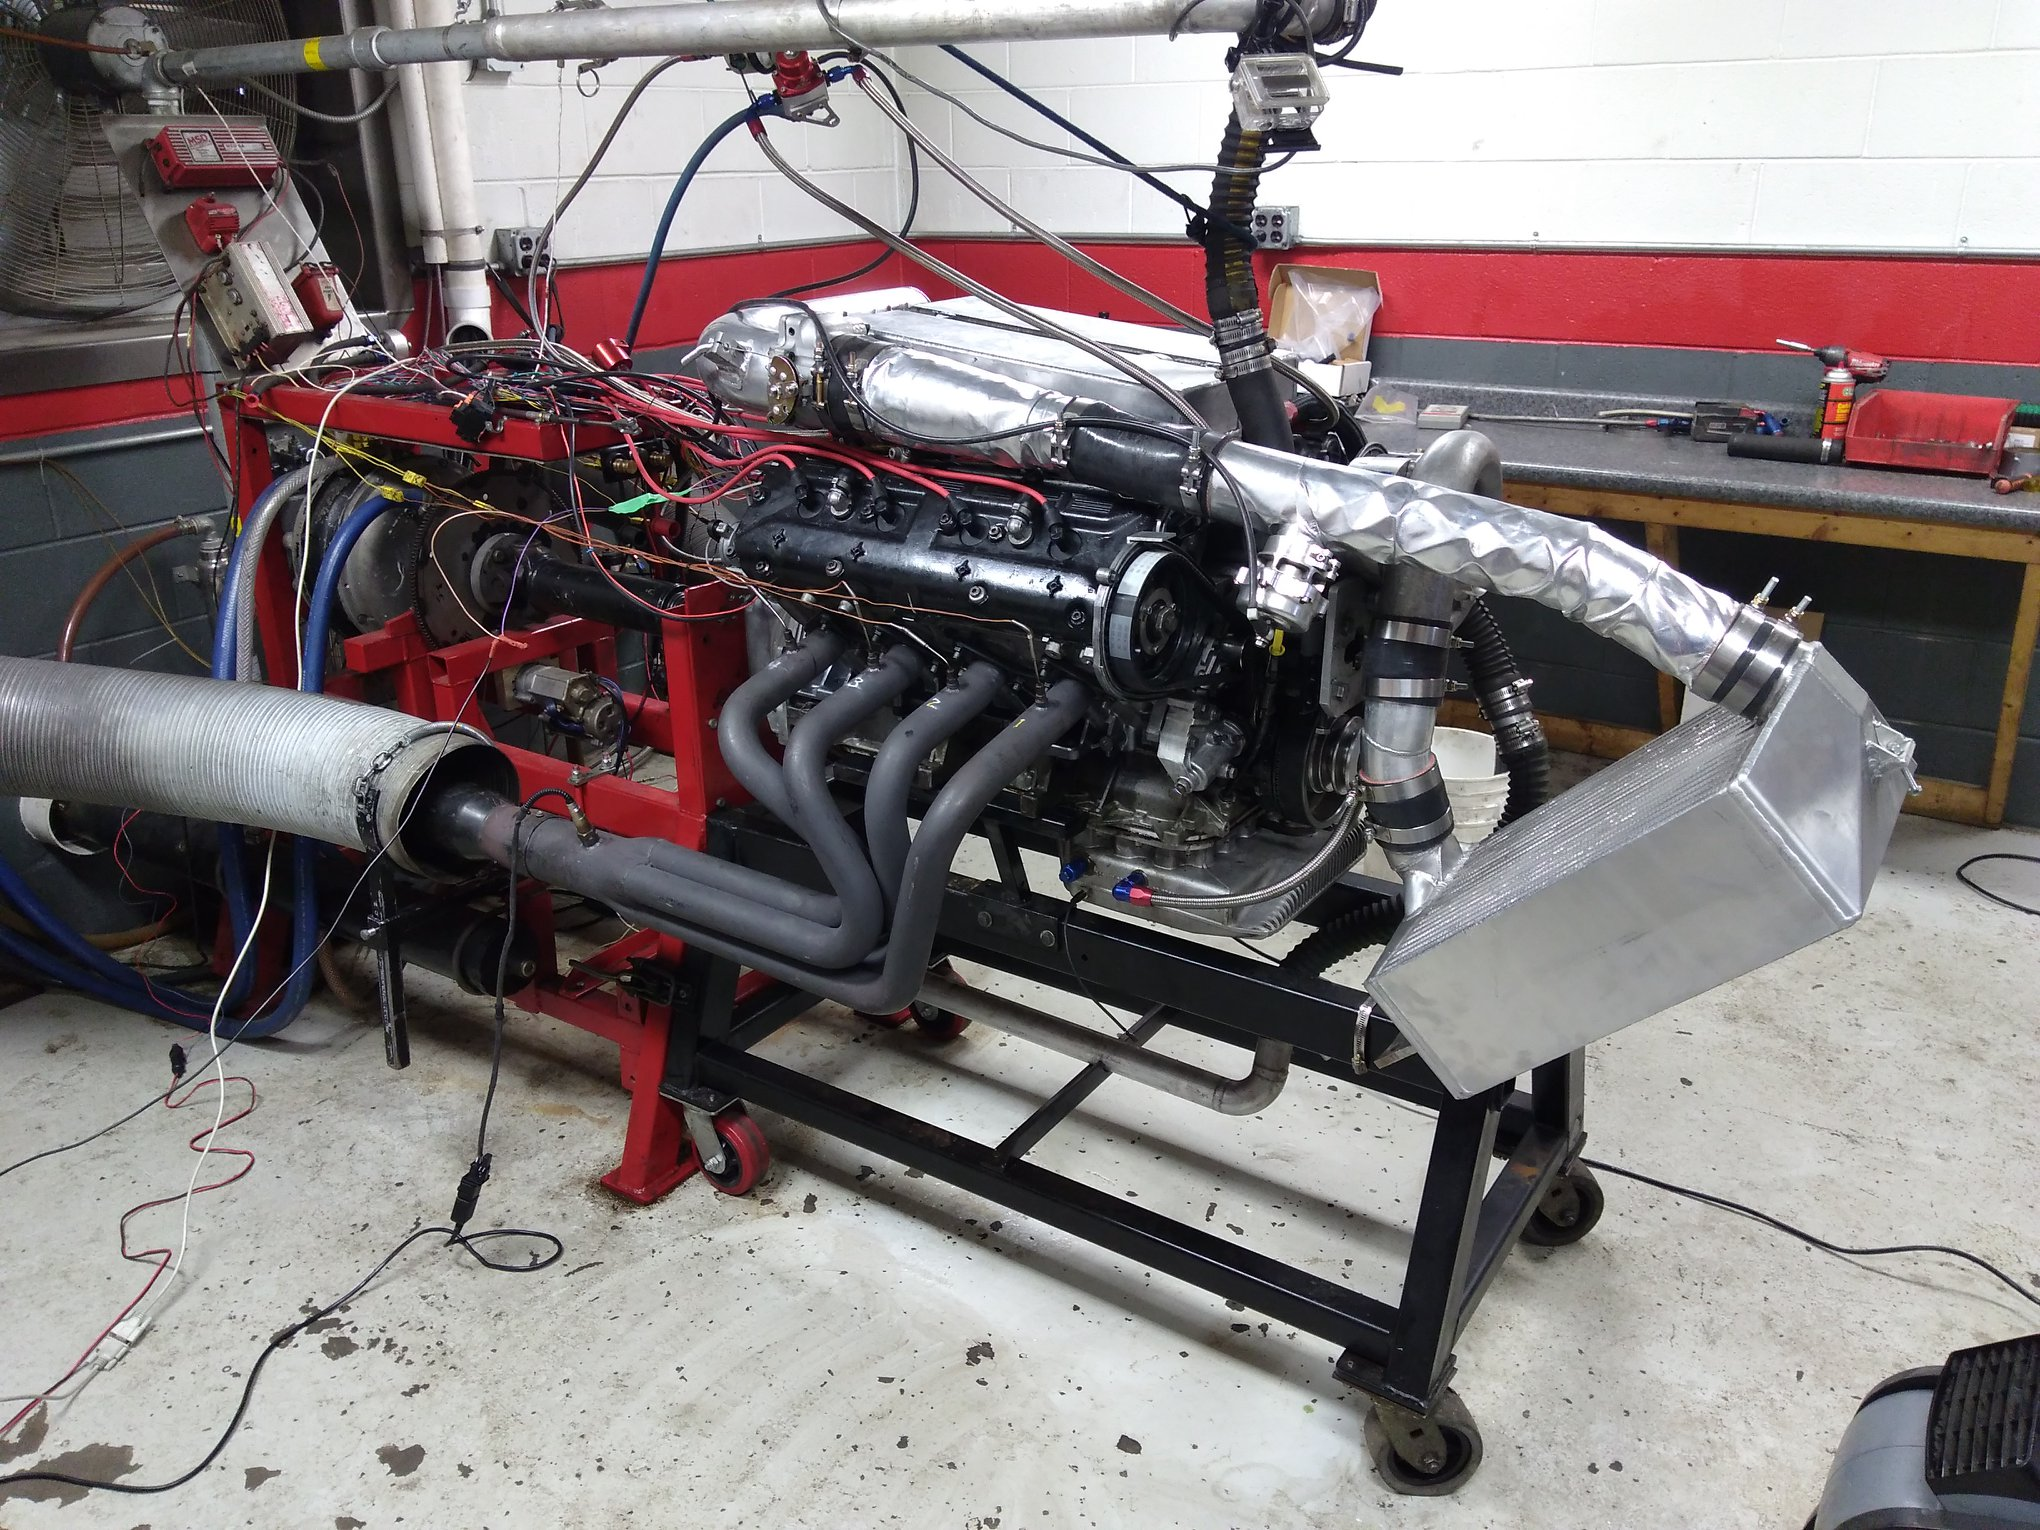 Supercharged Porsche 400 ci V8 Makes 897 hp on Dyno – Engine Swap Depot